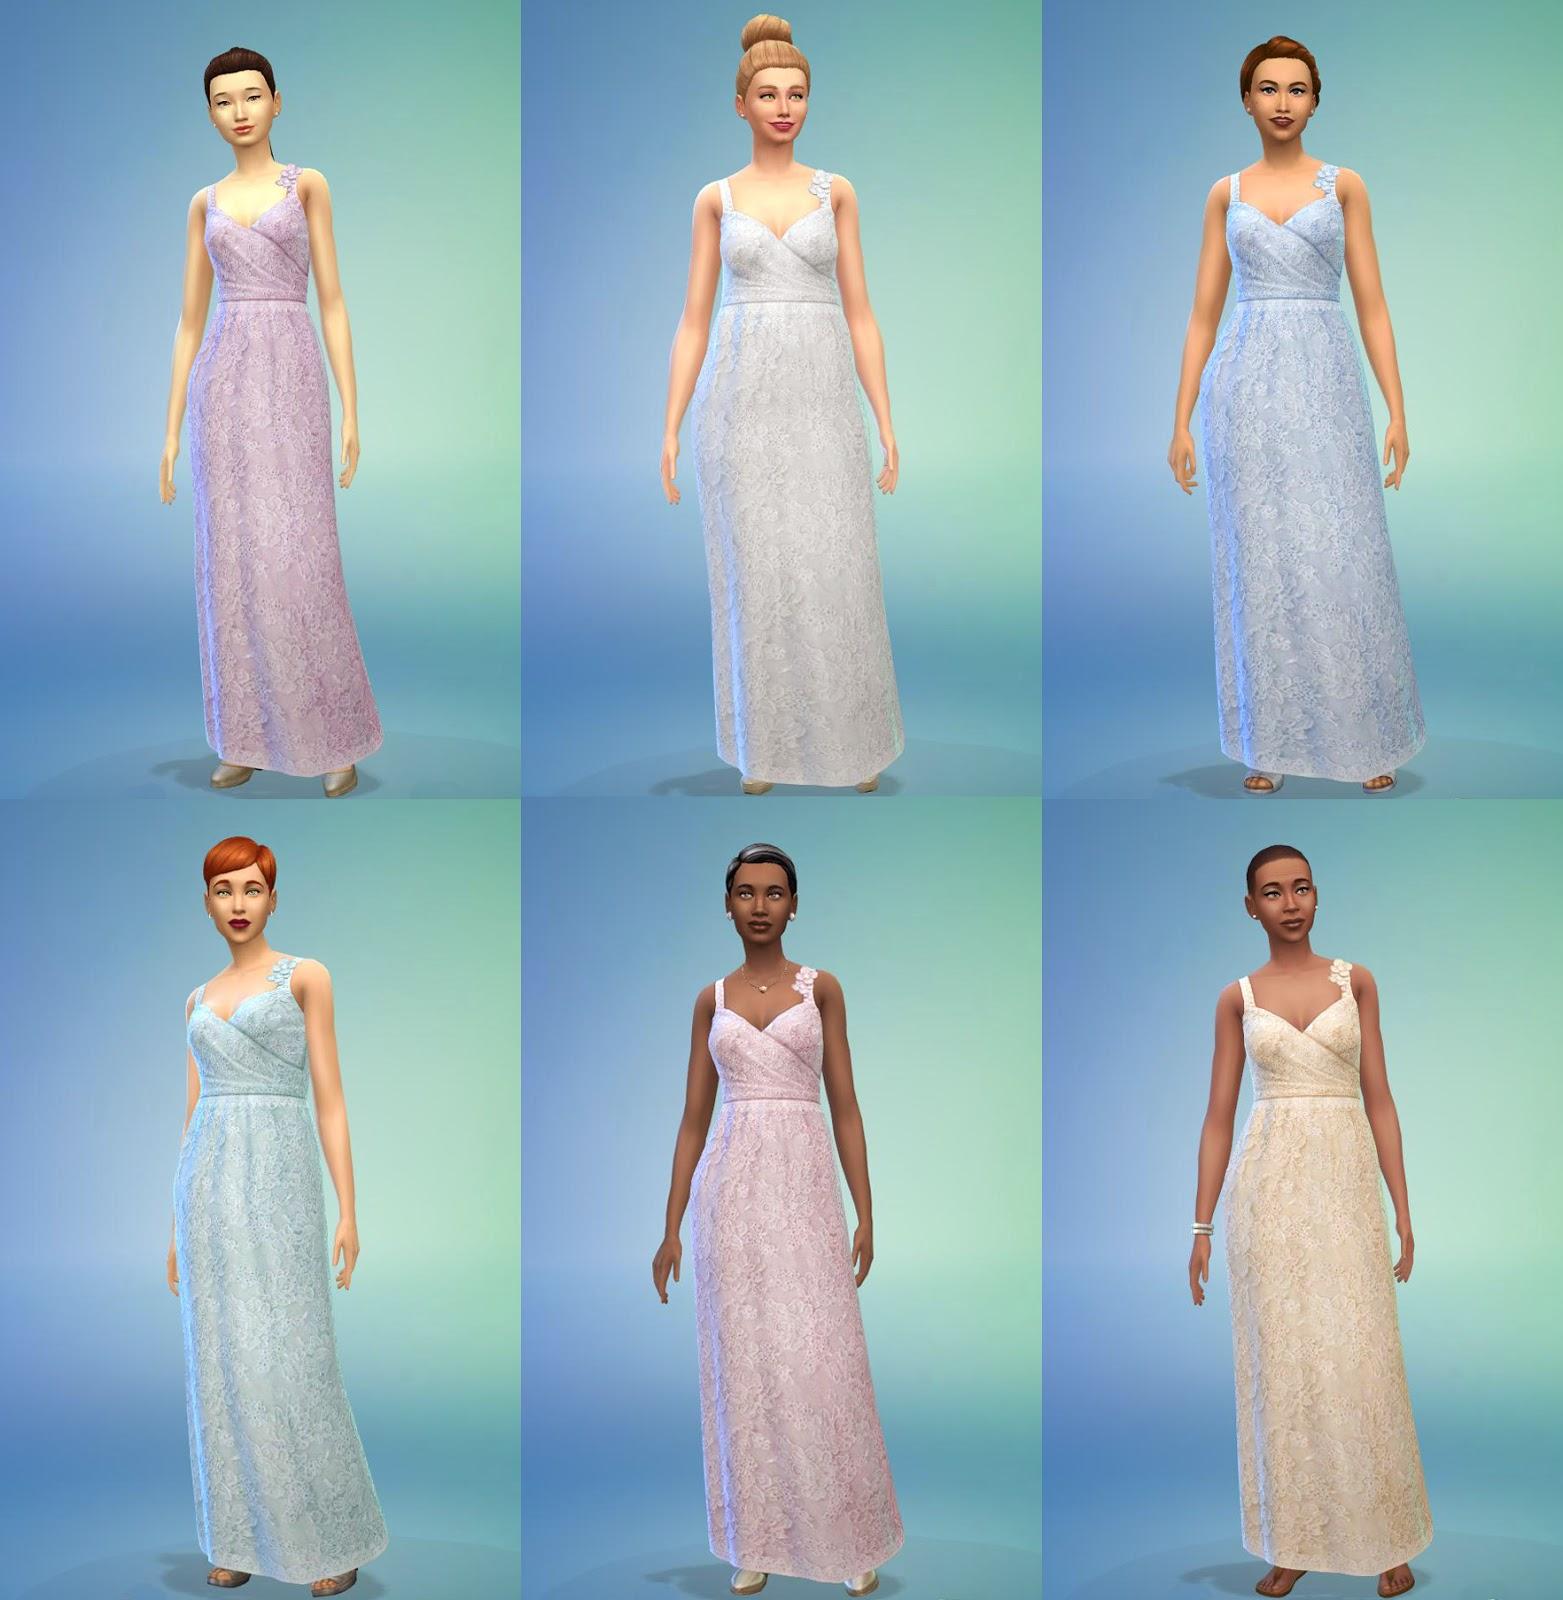 Sims 4 Wedding Dress.Sims 4 Wedding Dresses Saddha